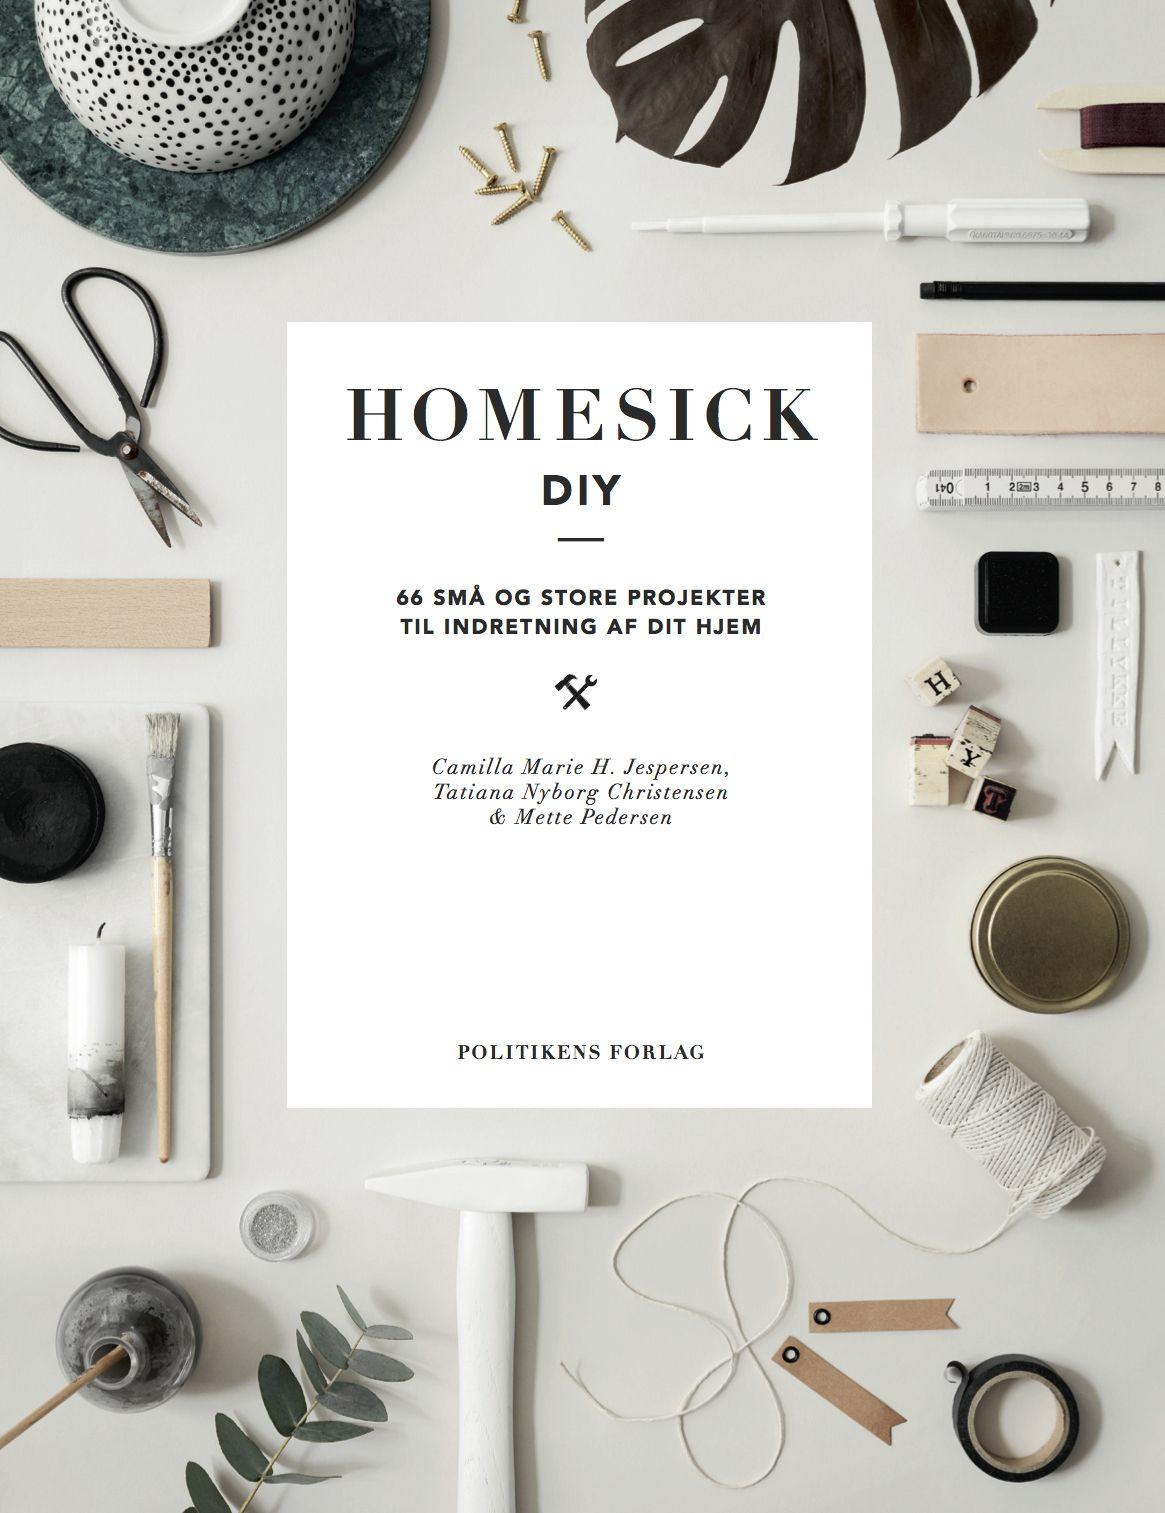 homesick diy books pinterest diy and crafts